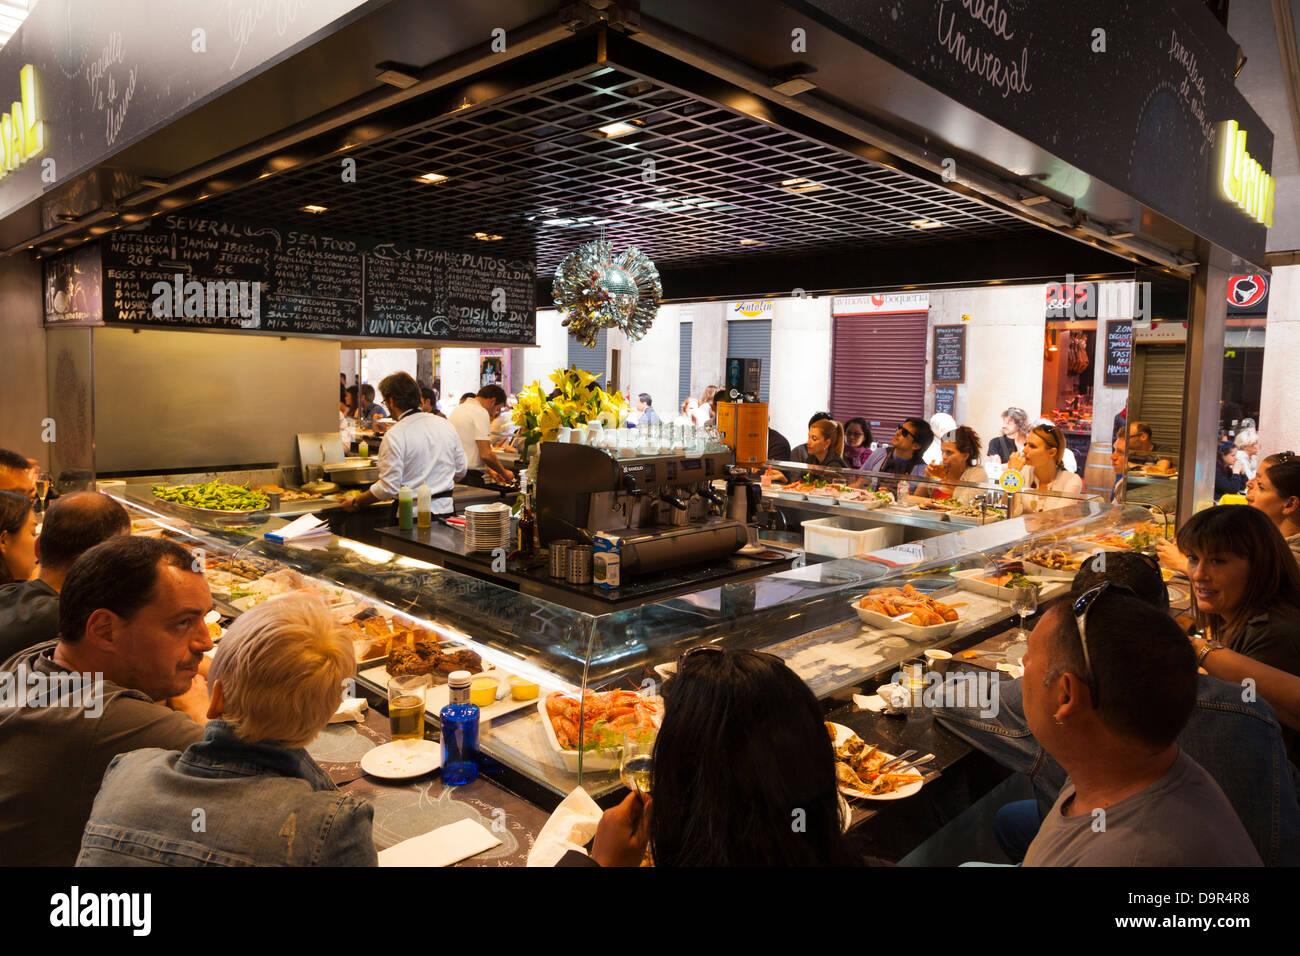 customers seated around a fish fast food cafe in La Boqueria Market Barcelona - Stock Image